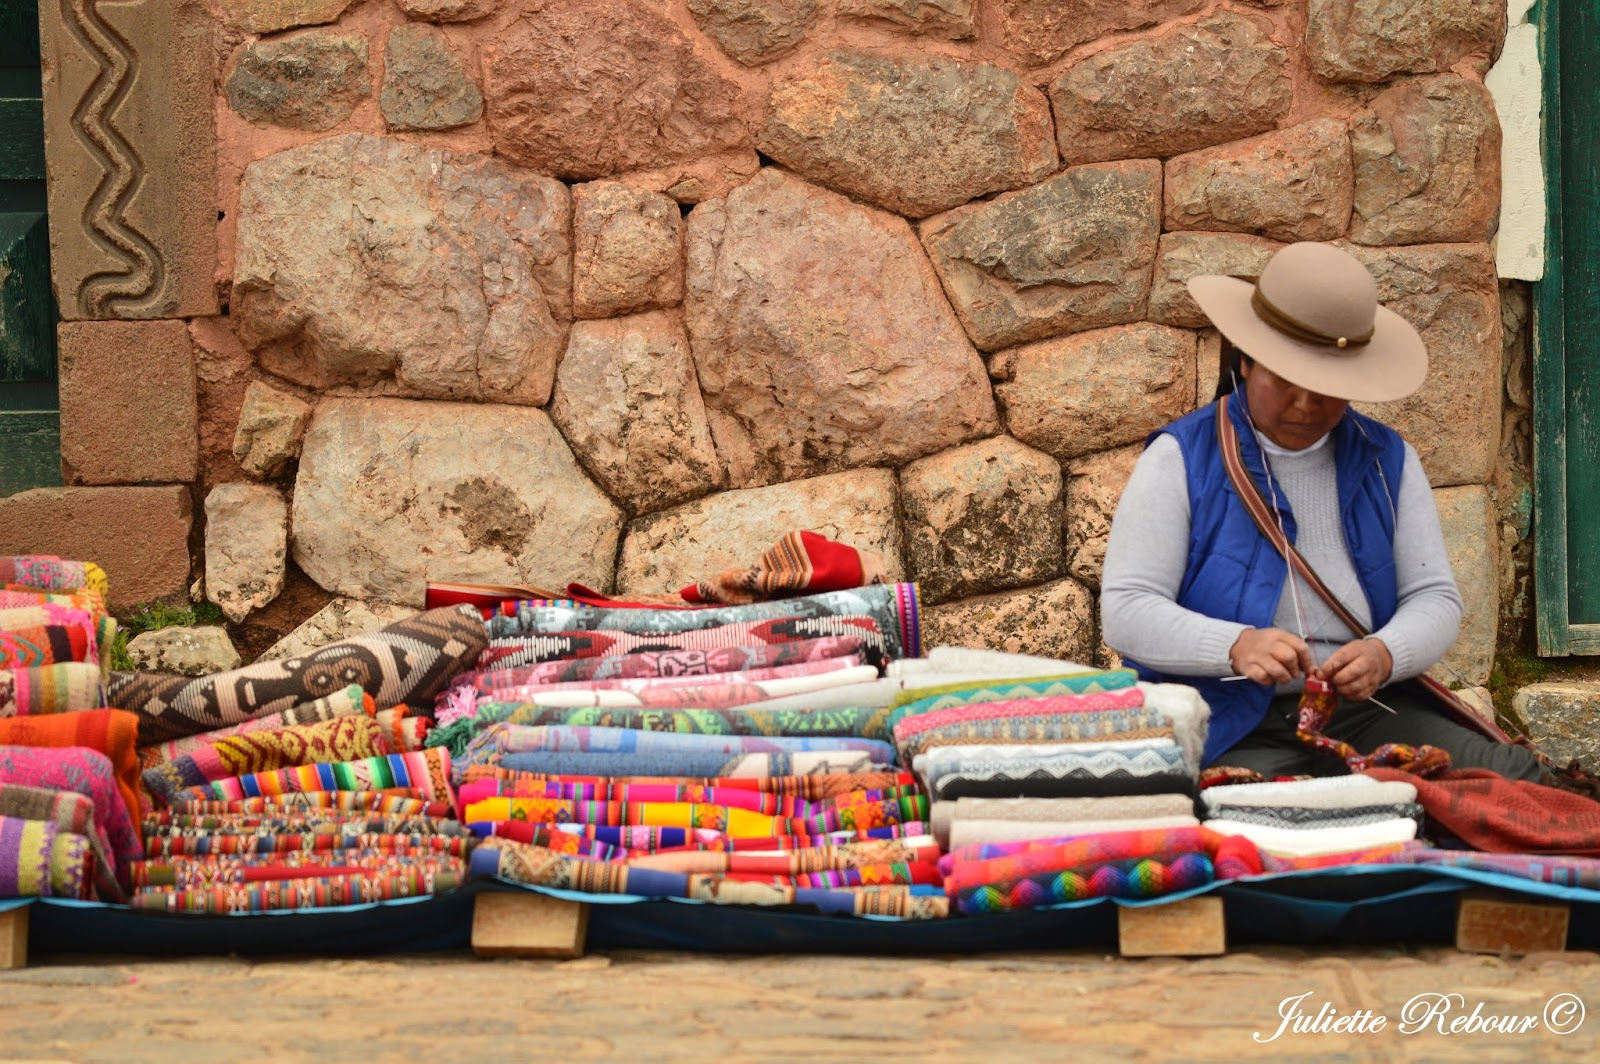 Marché artisanal de Chinchero